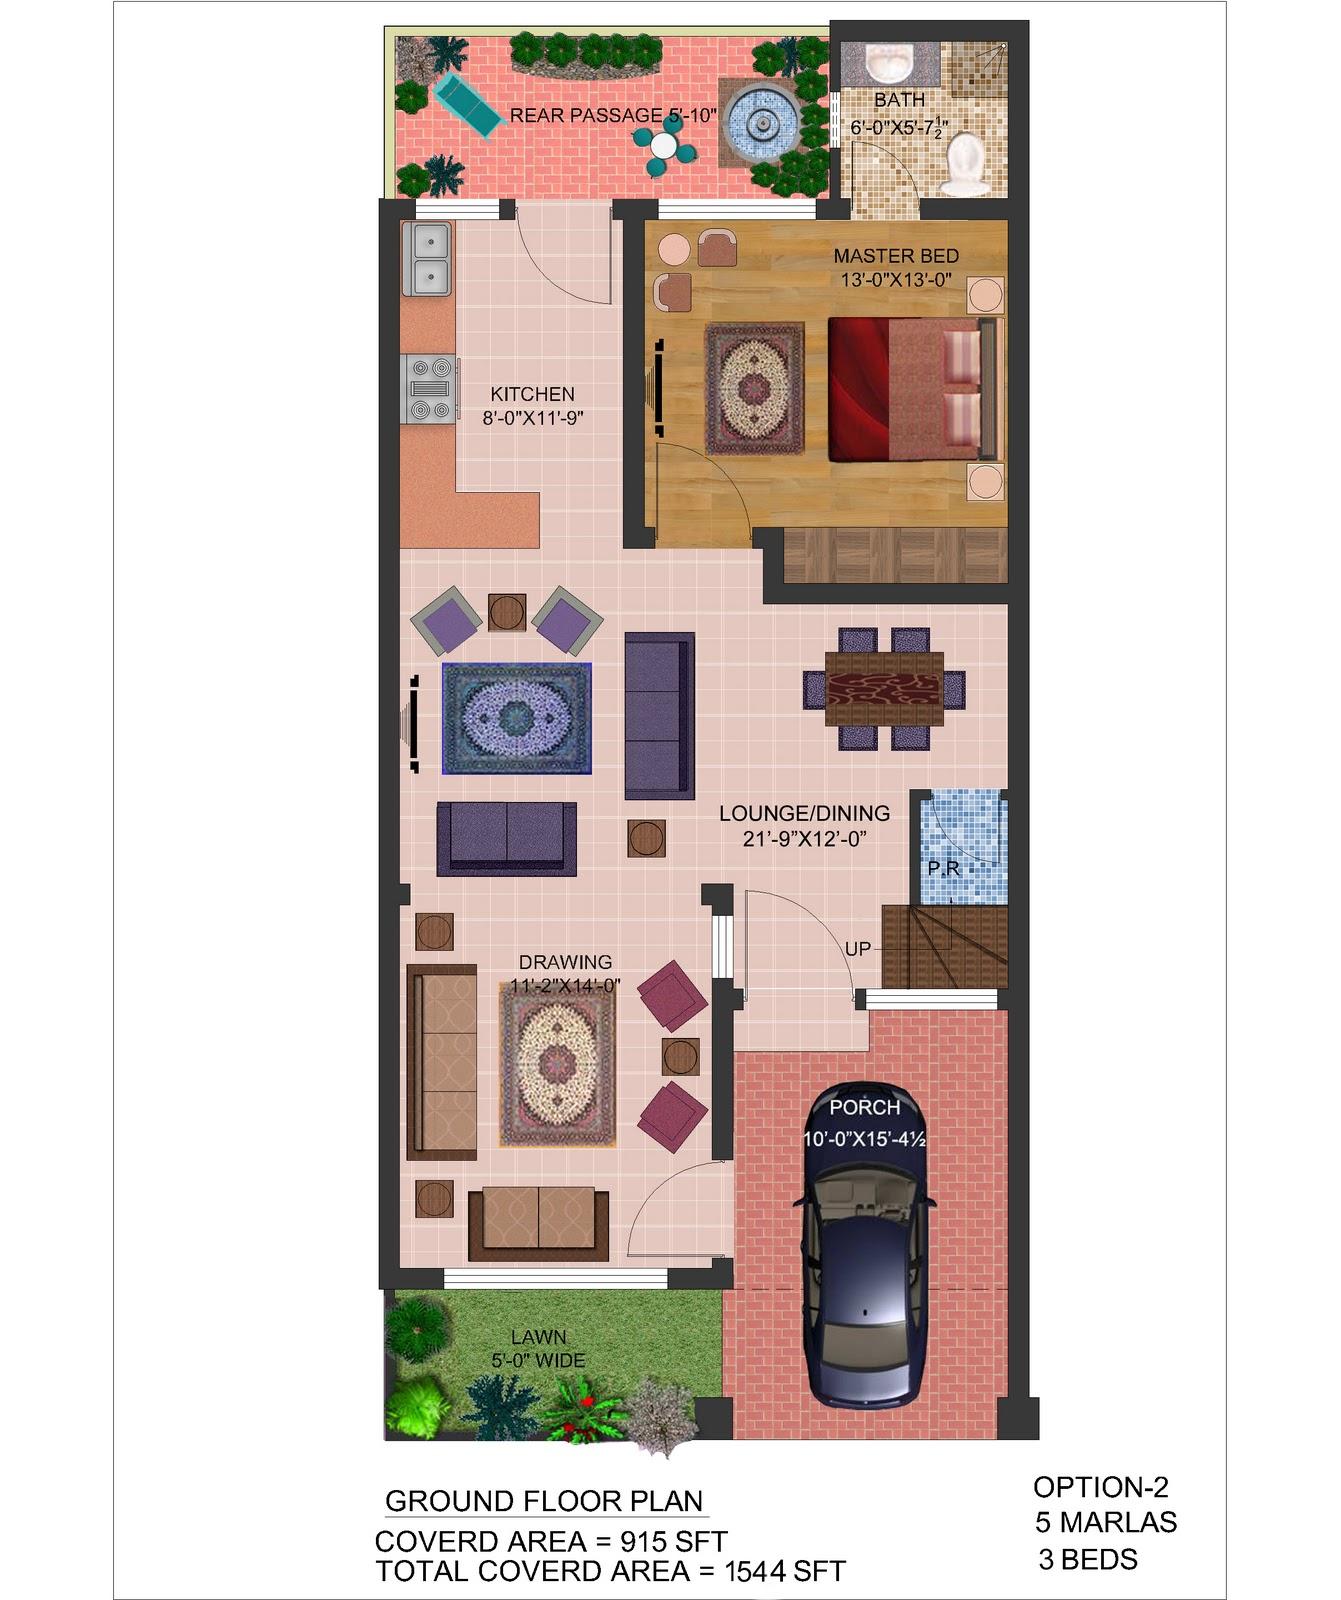 5 Marla House Plan Elevation Architecture Design: Casatreschic Interior: 5 Marla Front Elevation & Plan 2